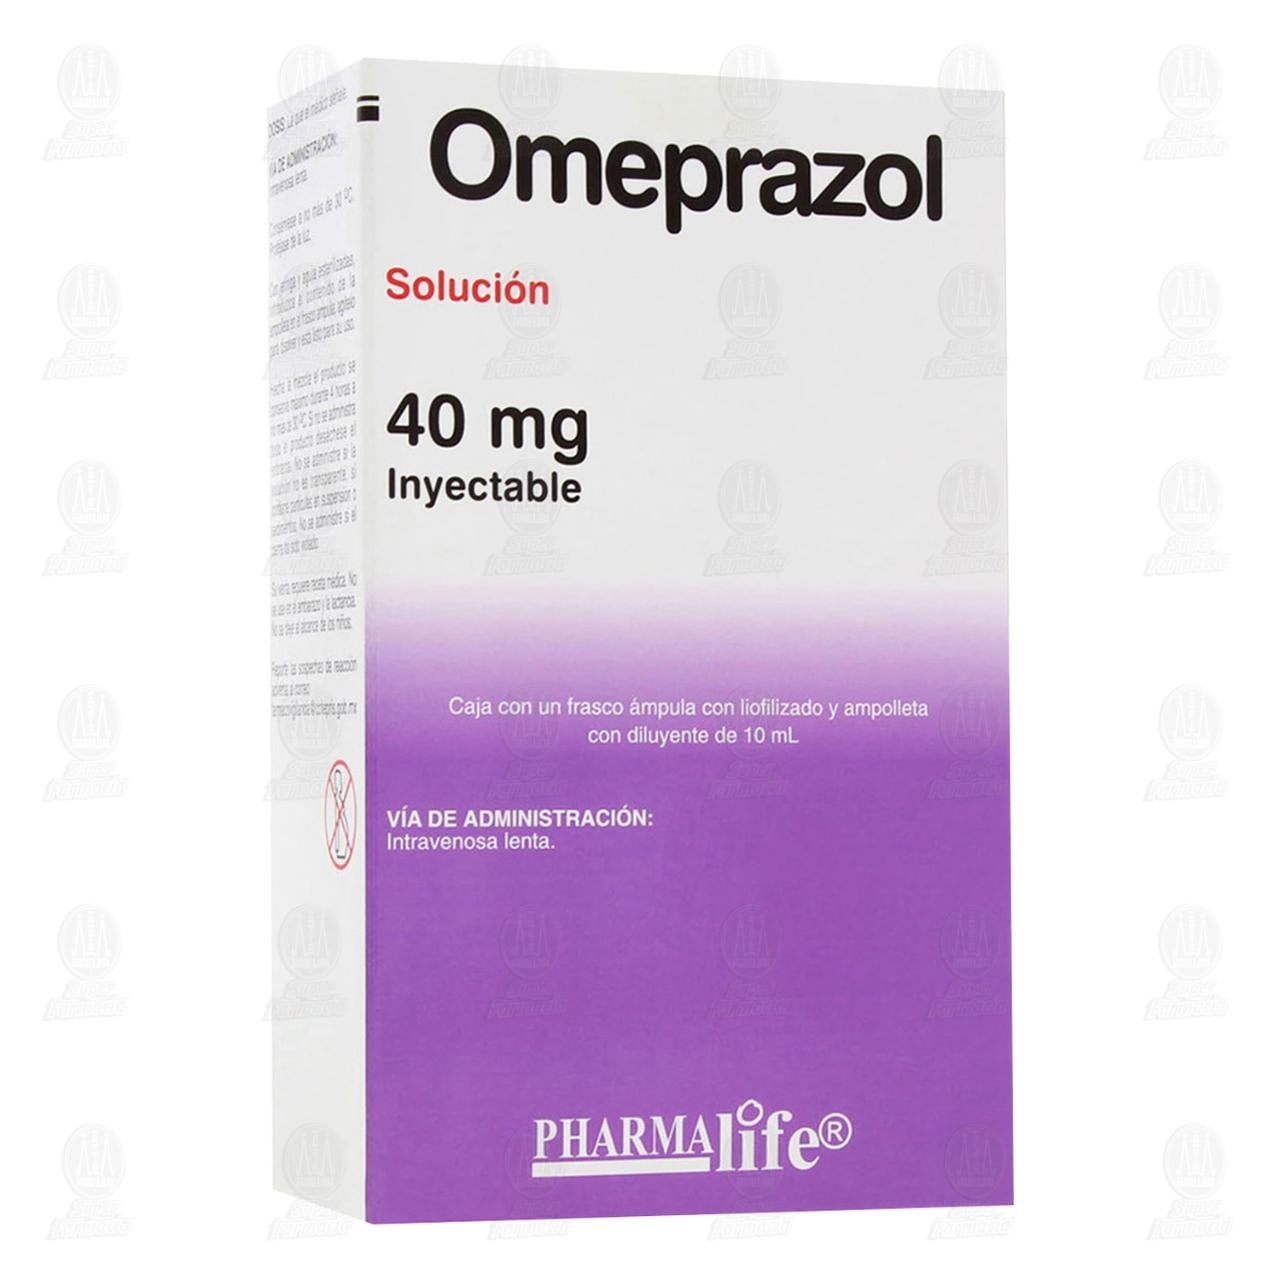 Comprar Omeprazol 40mg 10ml 1 Ampolleta Pharmalife en Farmacias Guadalajara